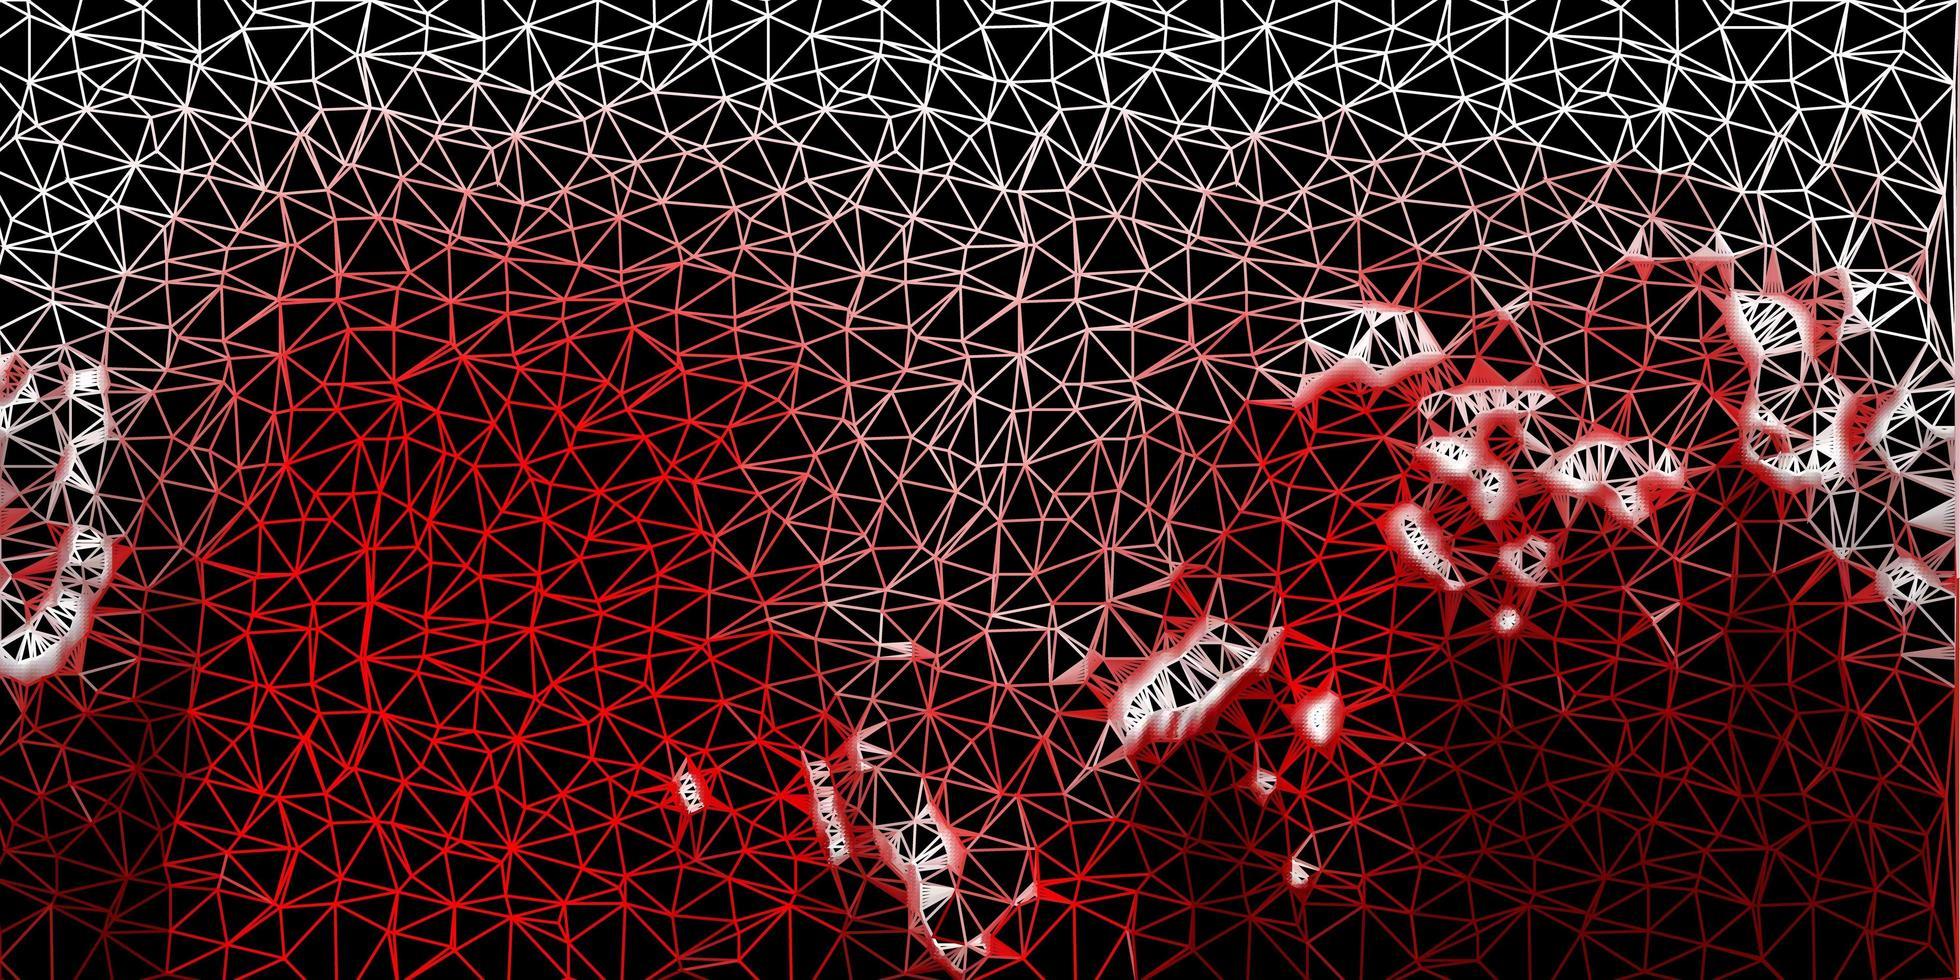 textura de triângulo poli vector vermelho escuro.